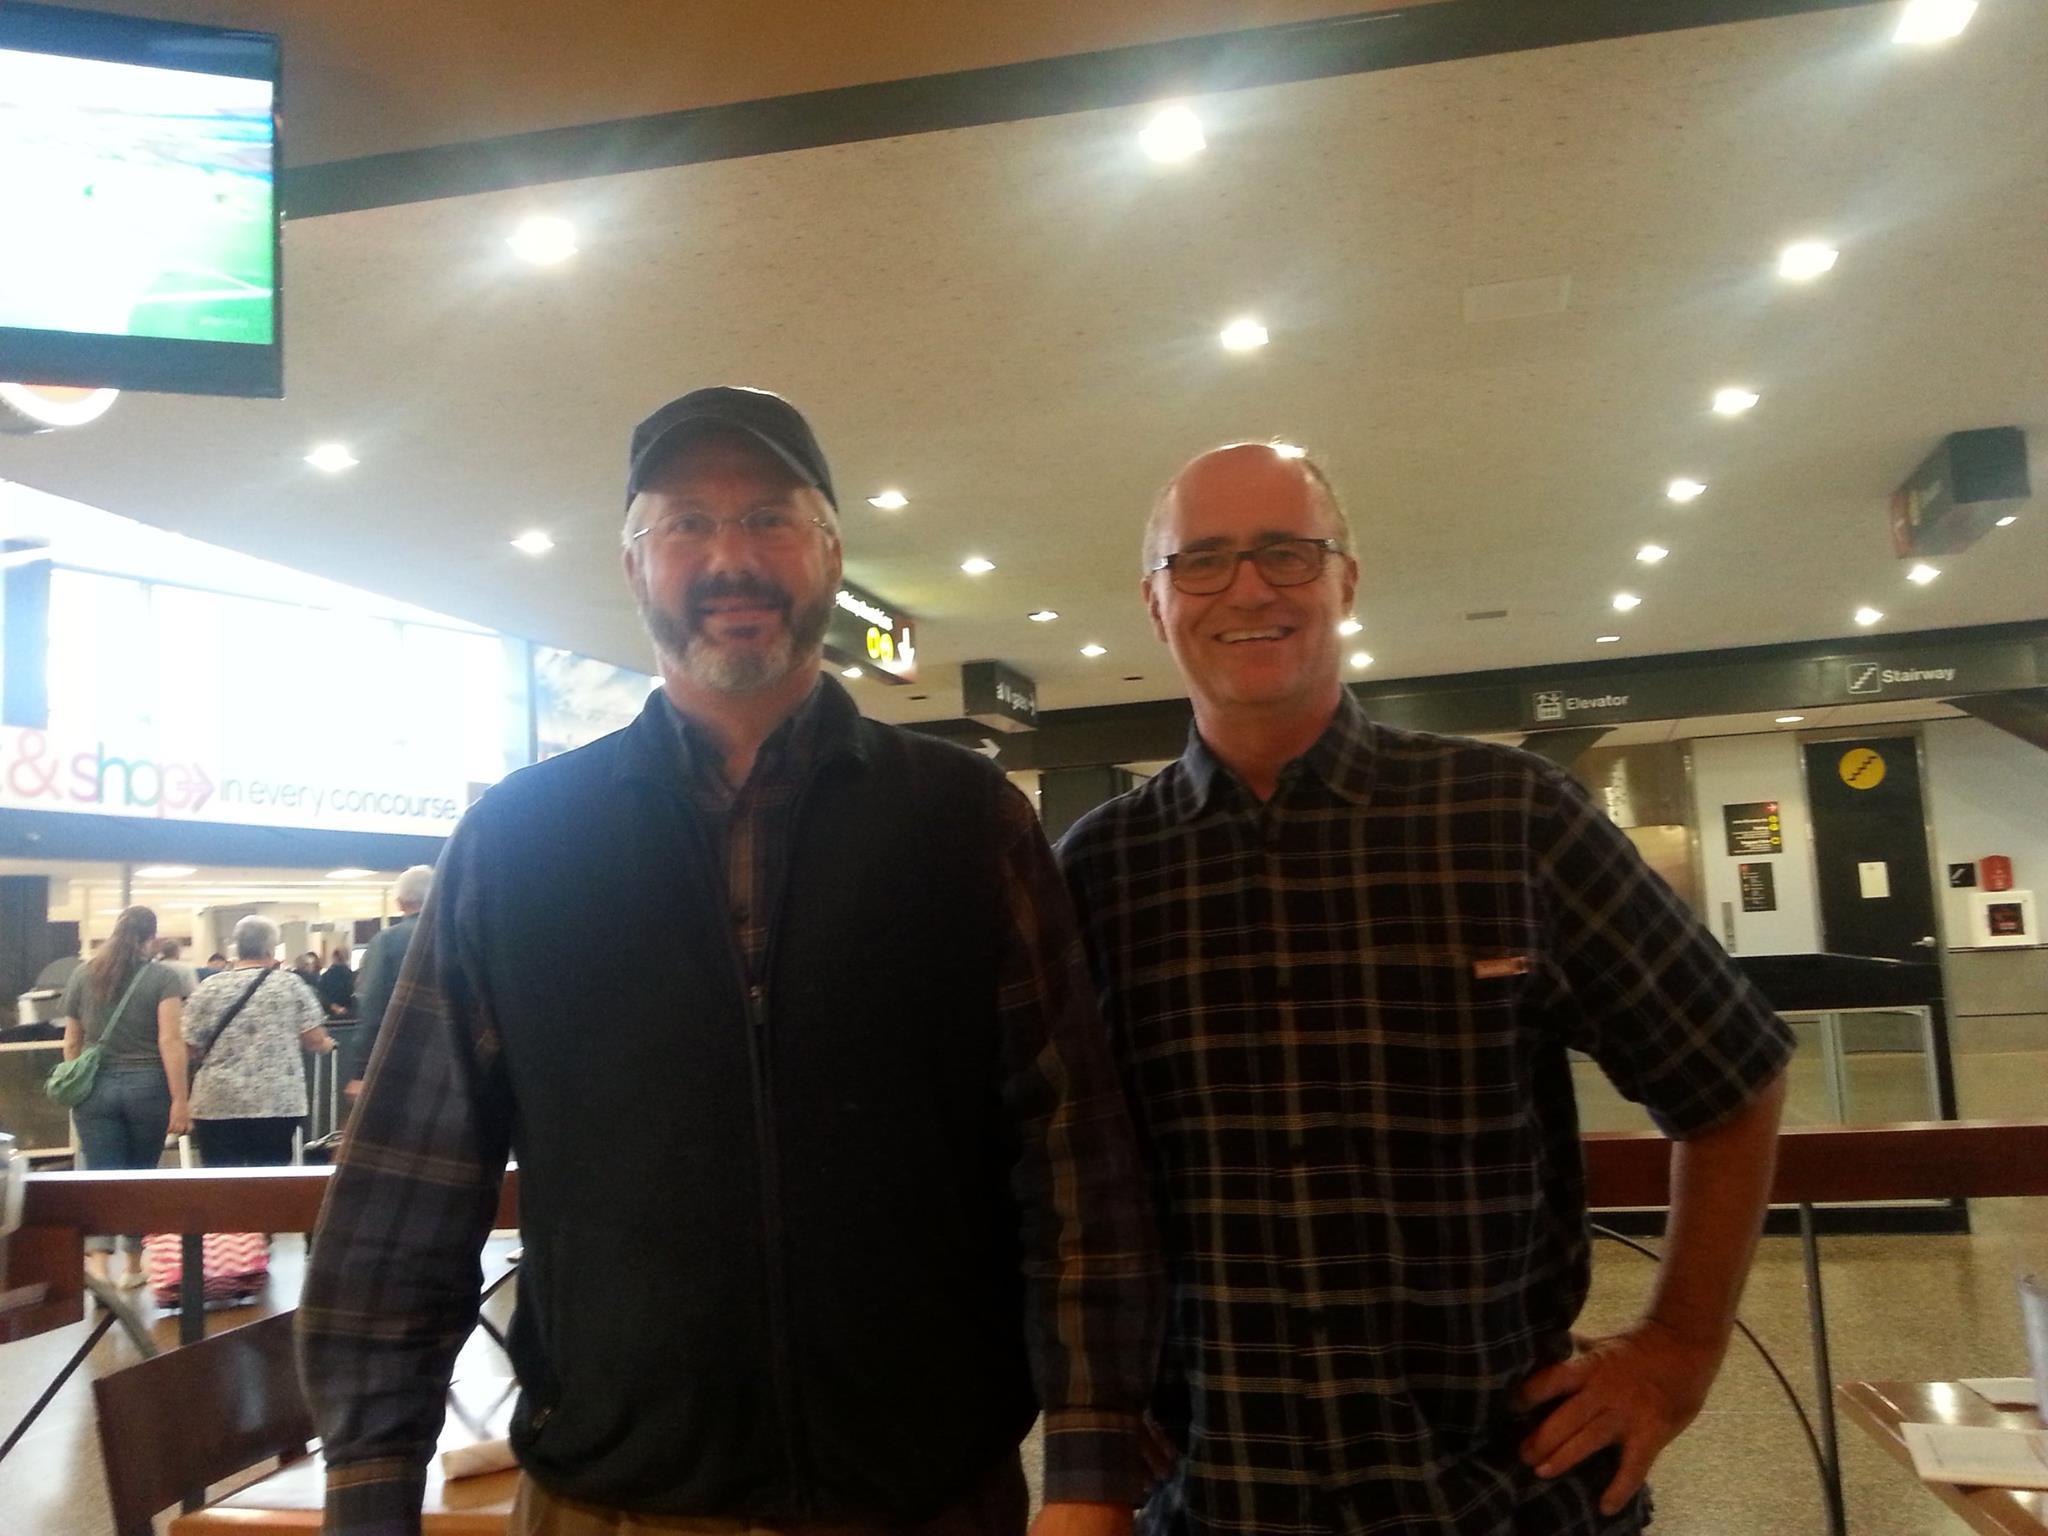 Zeno & brettlees at SeaTac Airport